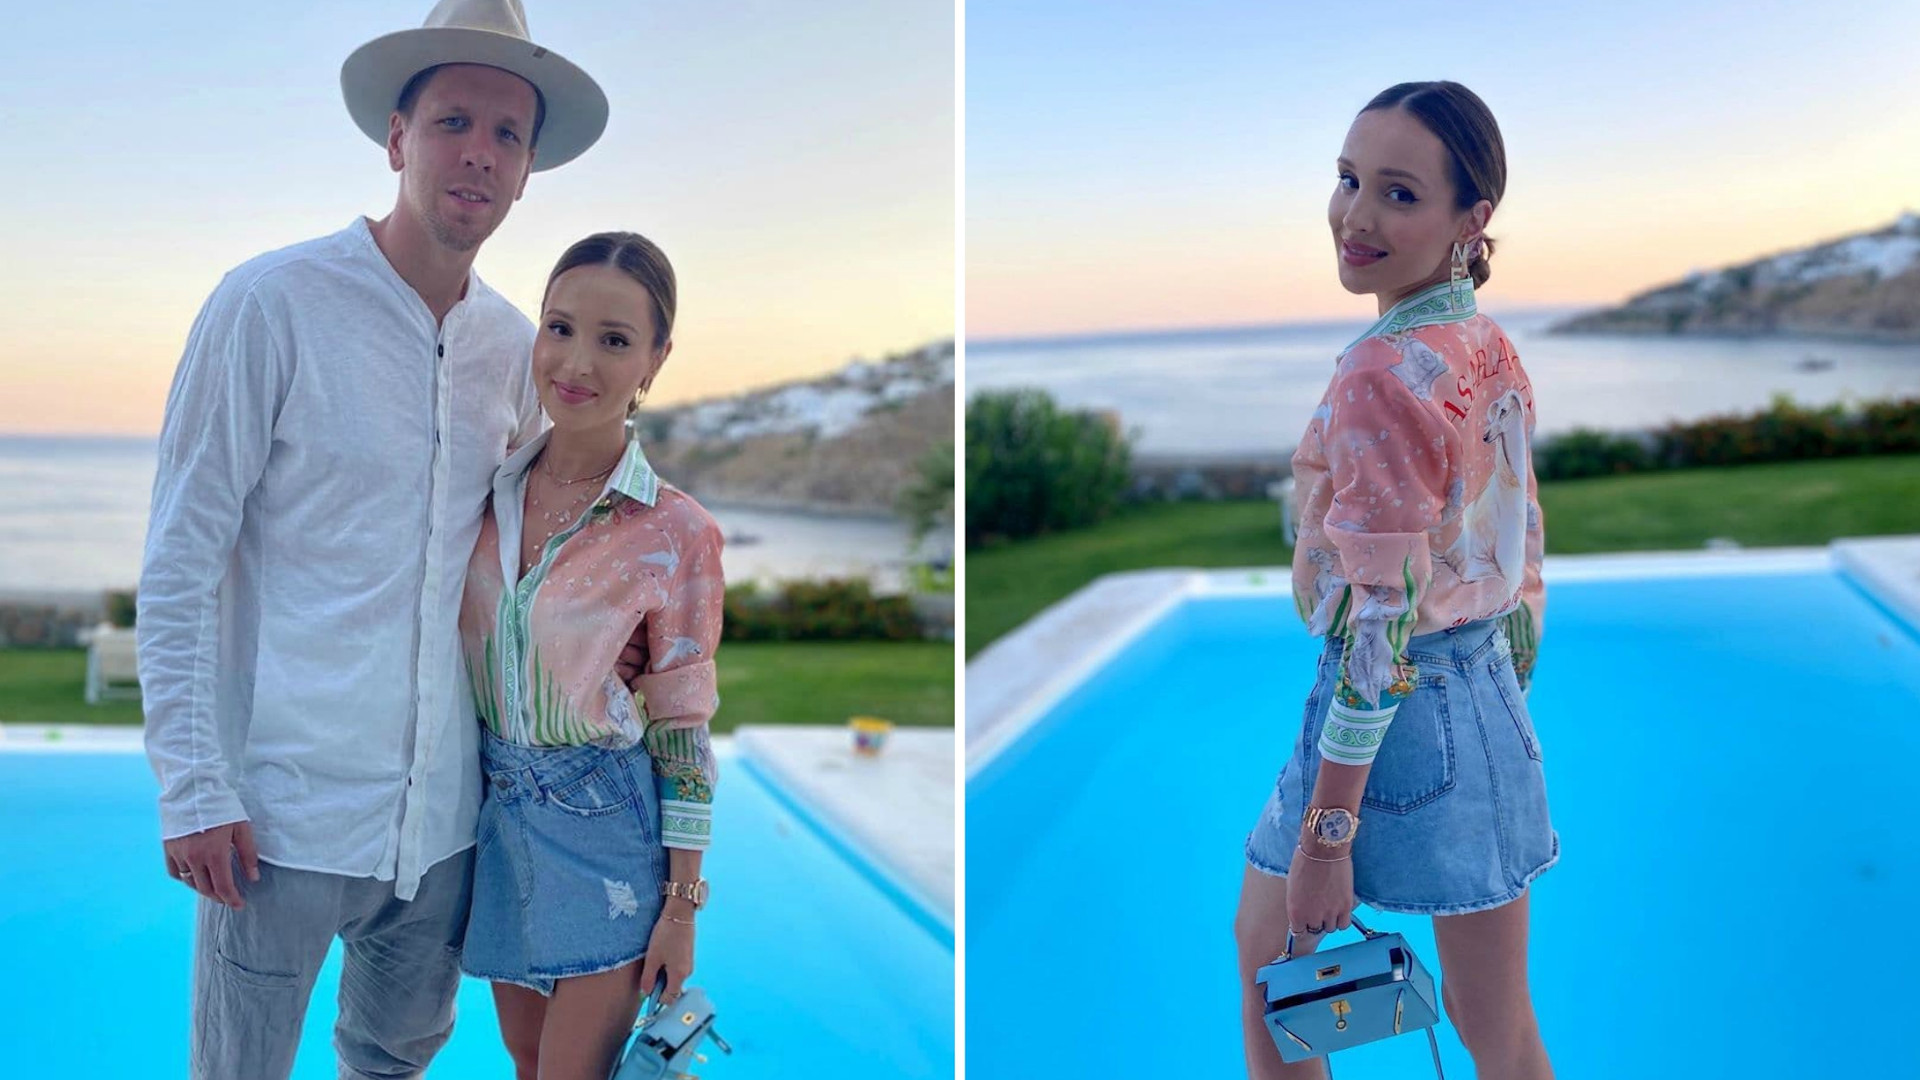 Marina i Wojciech Szczęśni na tle basenu